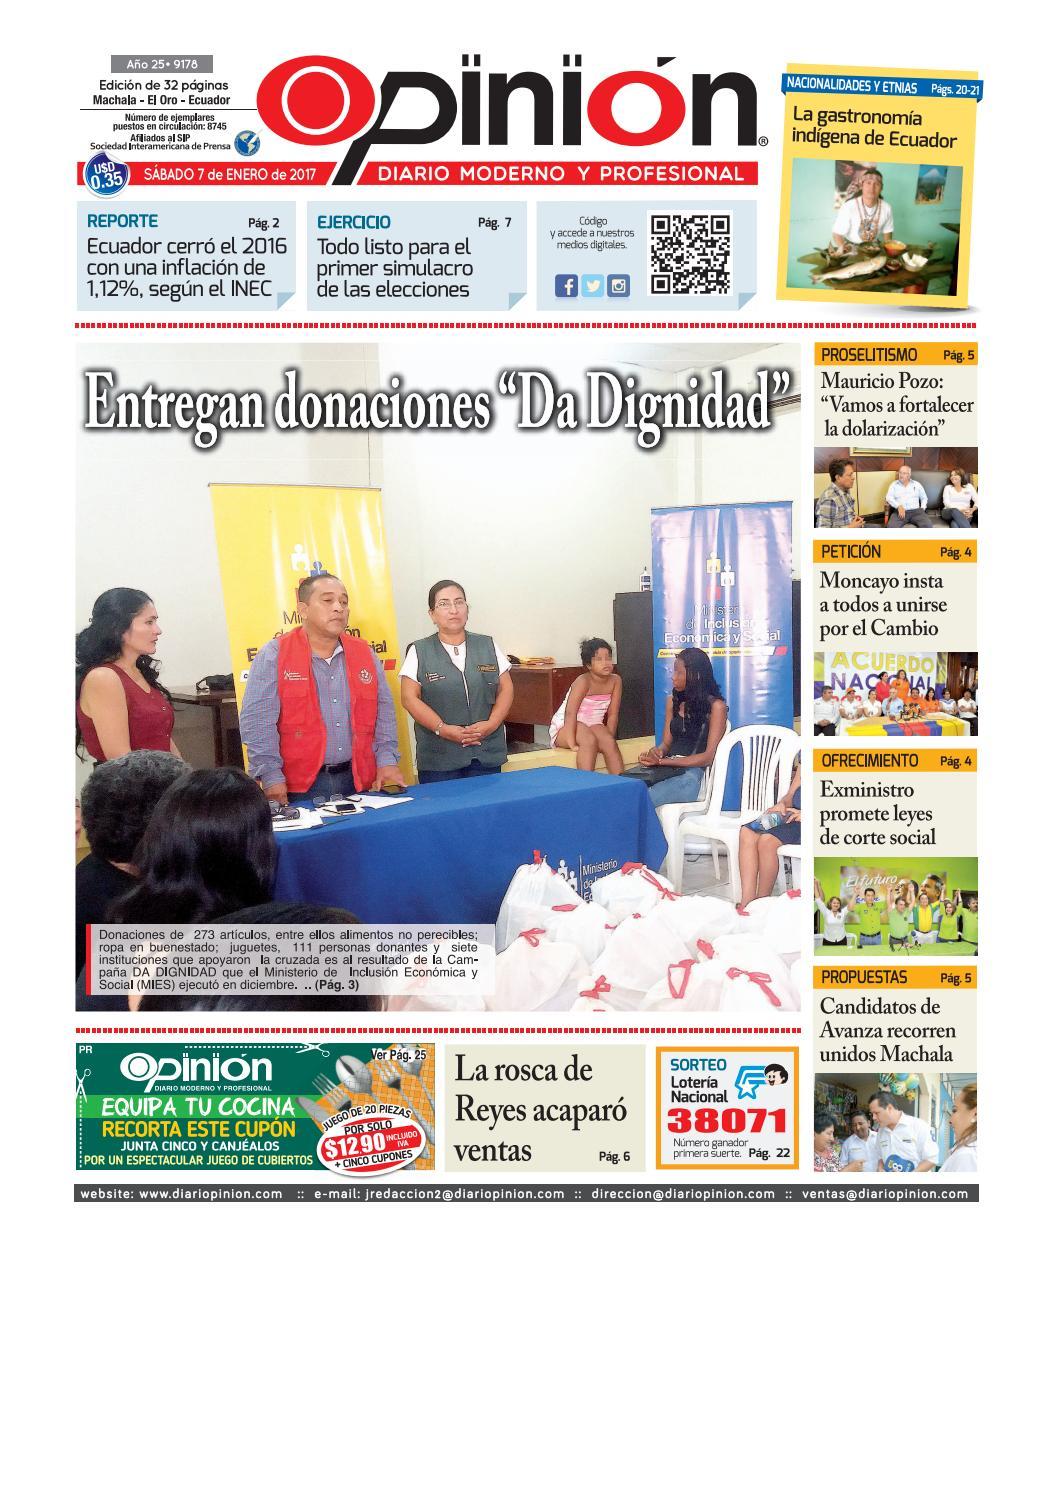 Impreso 07 01 17 by Diario Opinion - issuu